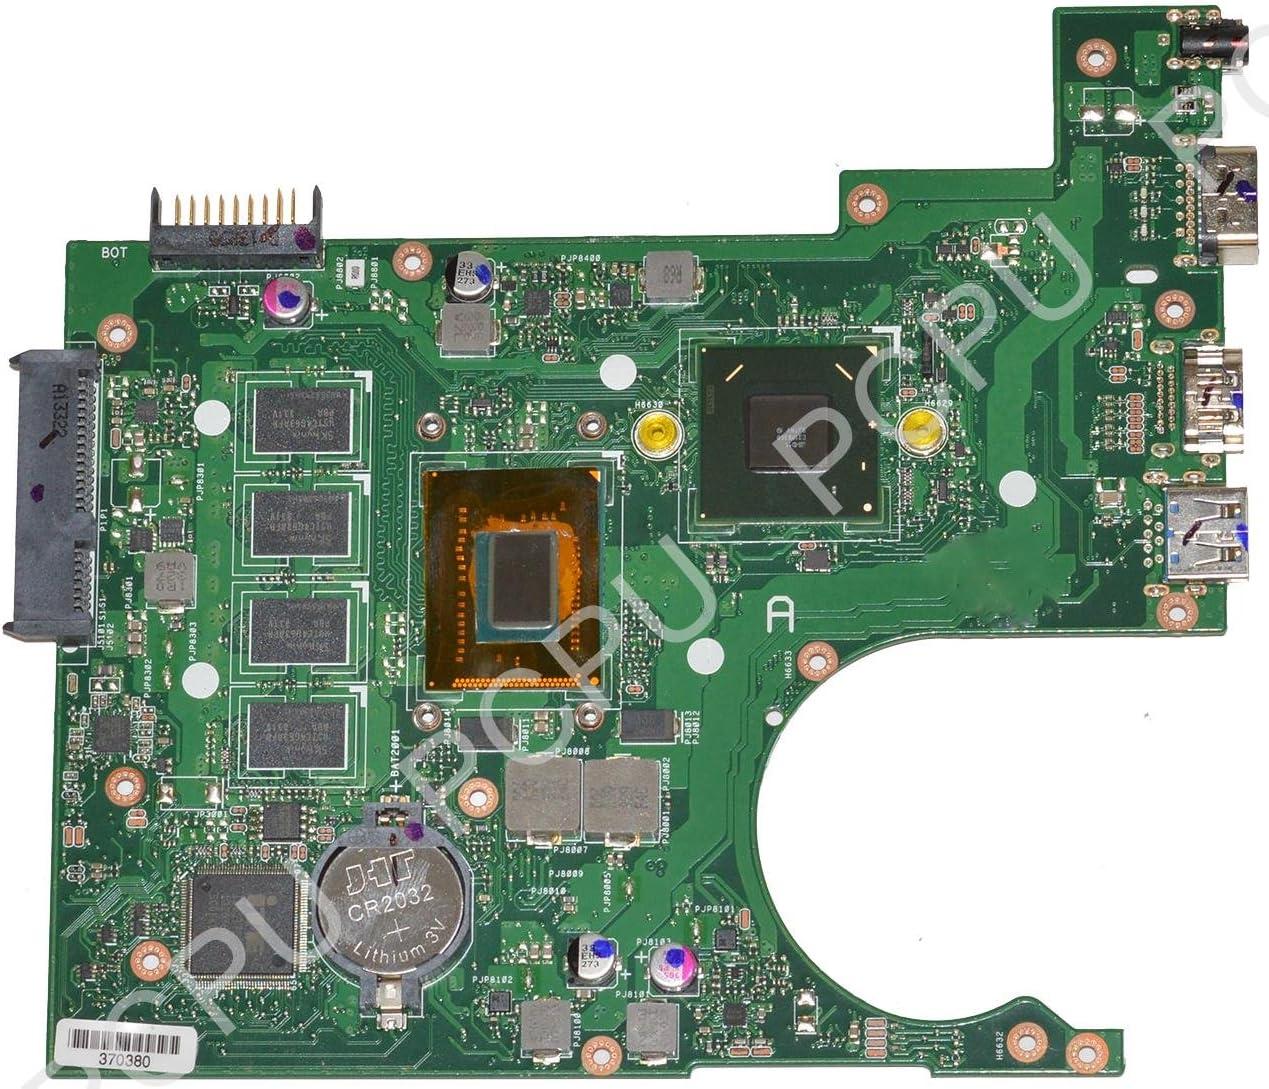 60NB02X0-MB3020 Asus X200CA Laptop Motherboard 4GB w/Intel Celeron 1007U 1.5GHz CPU